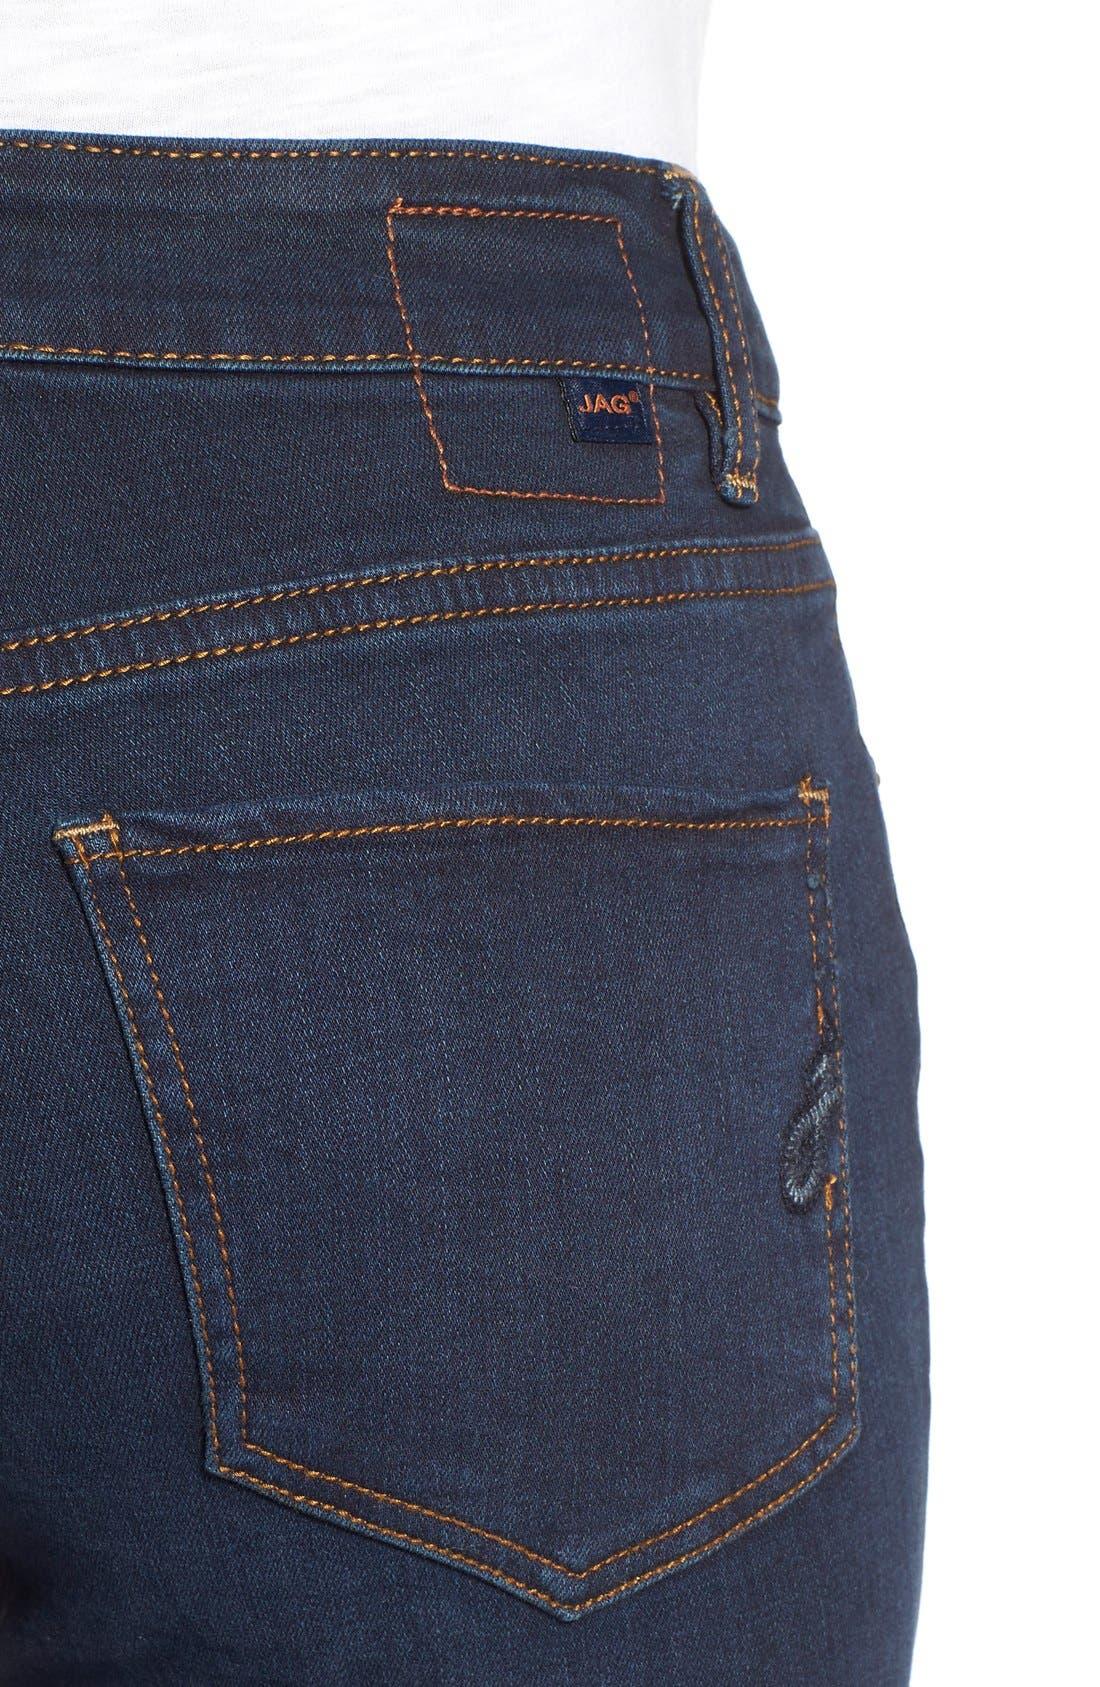 Alternate Image 4  - Jag Jeans'Westlake' StretchSkinnyJeans (Indigo Steel)